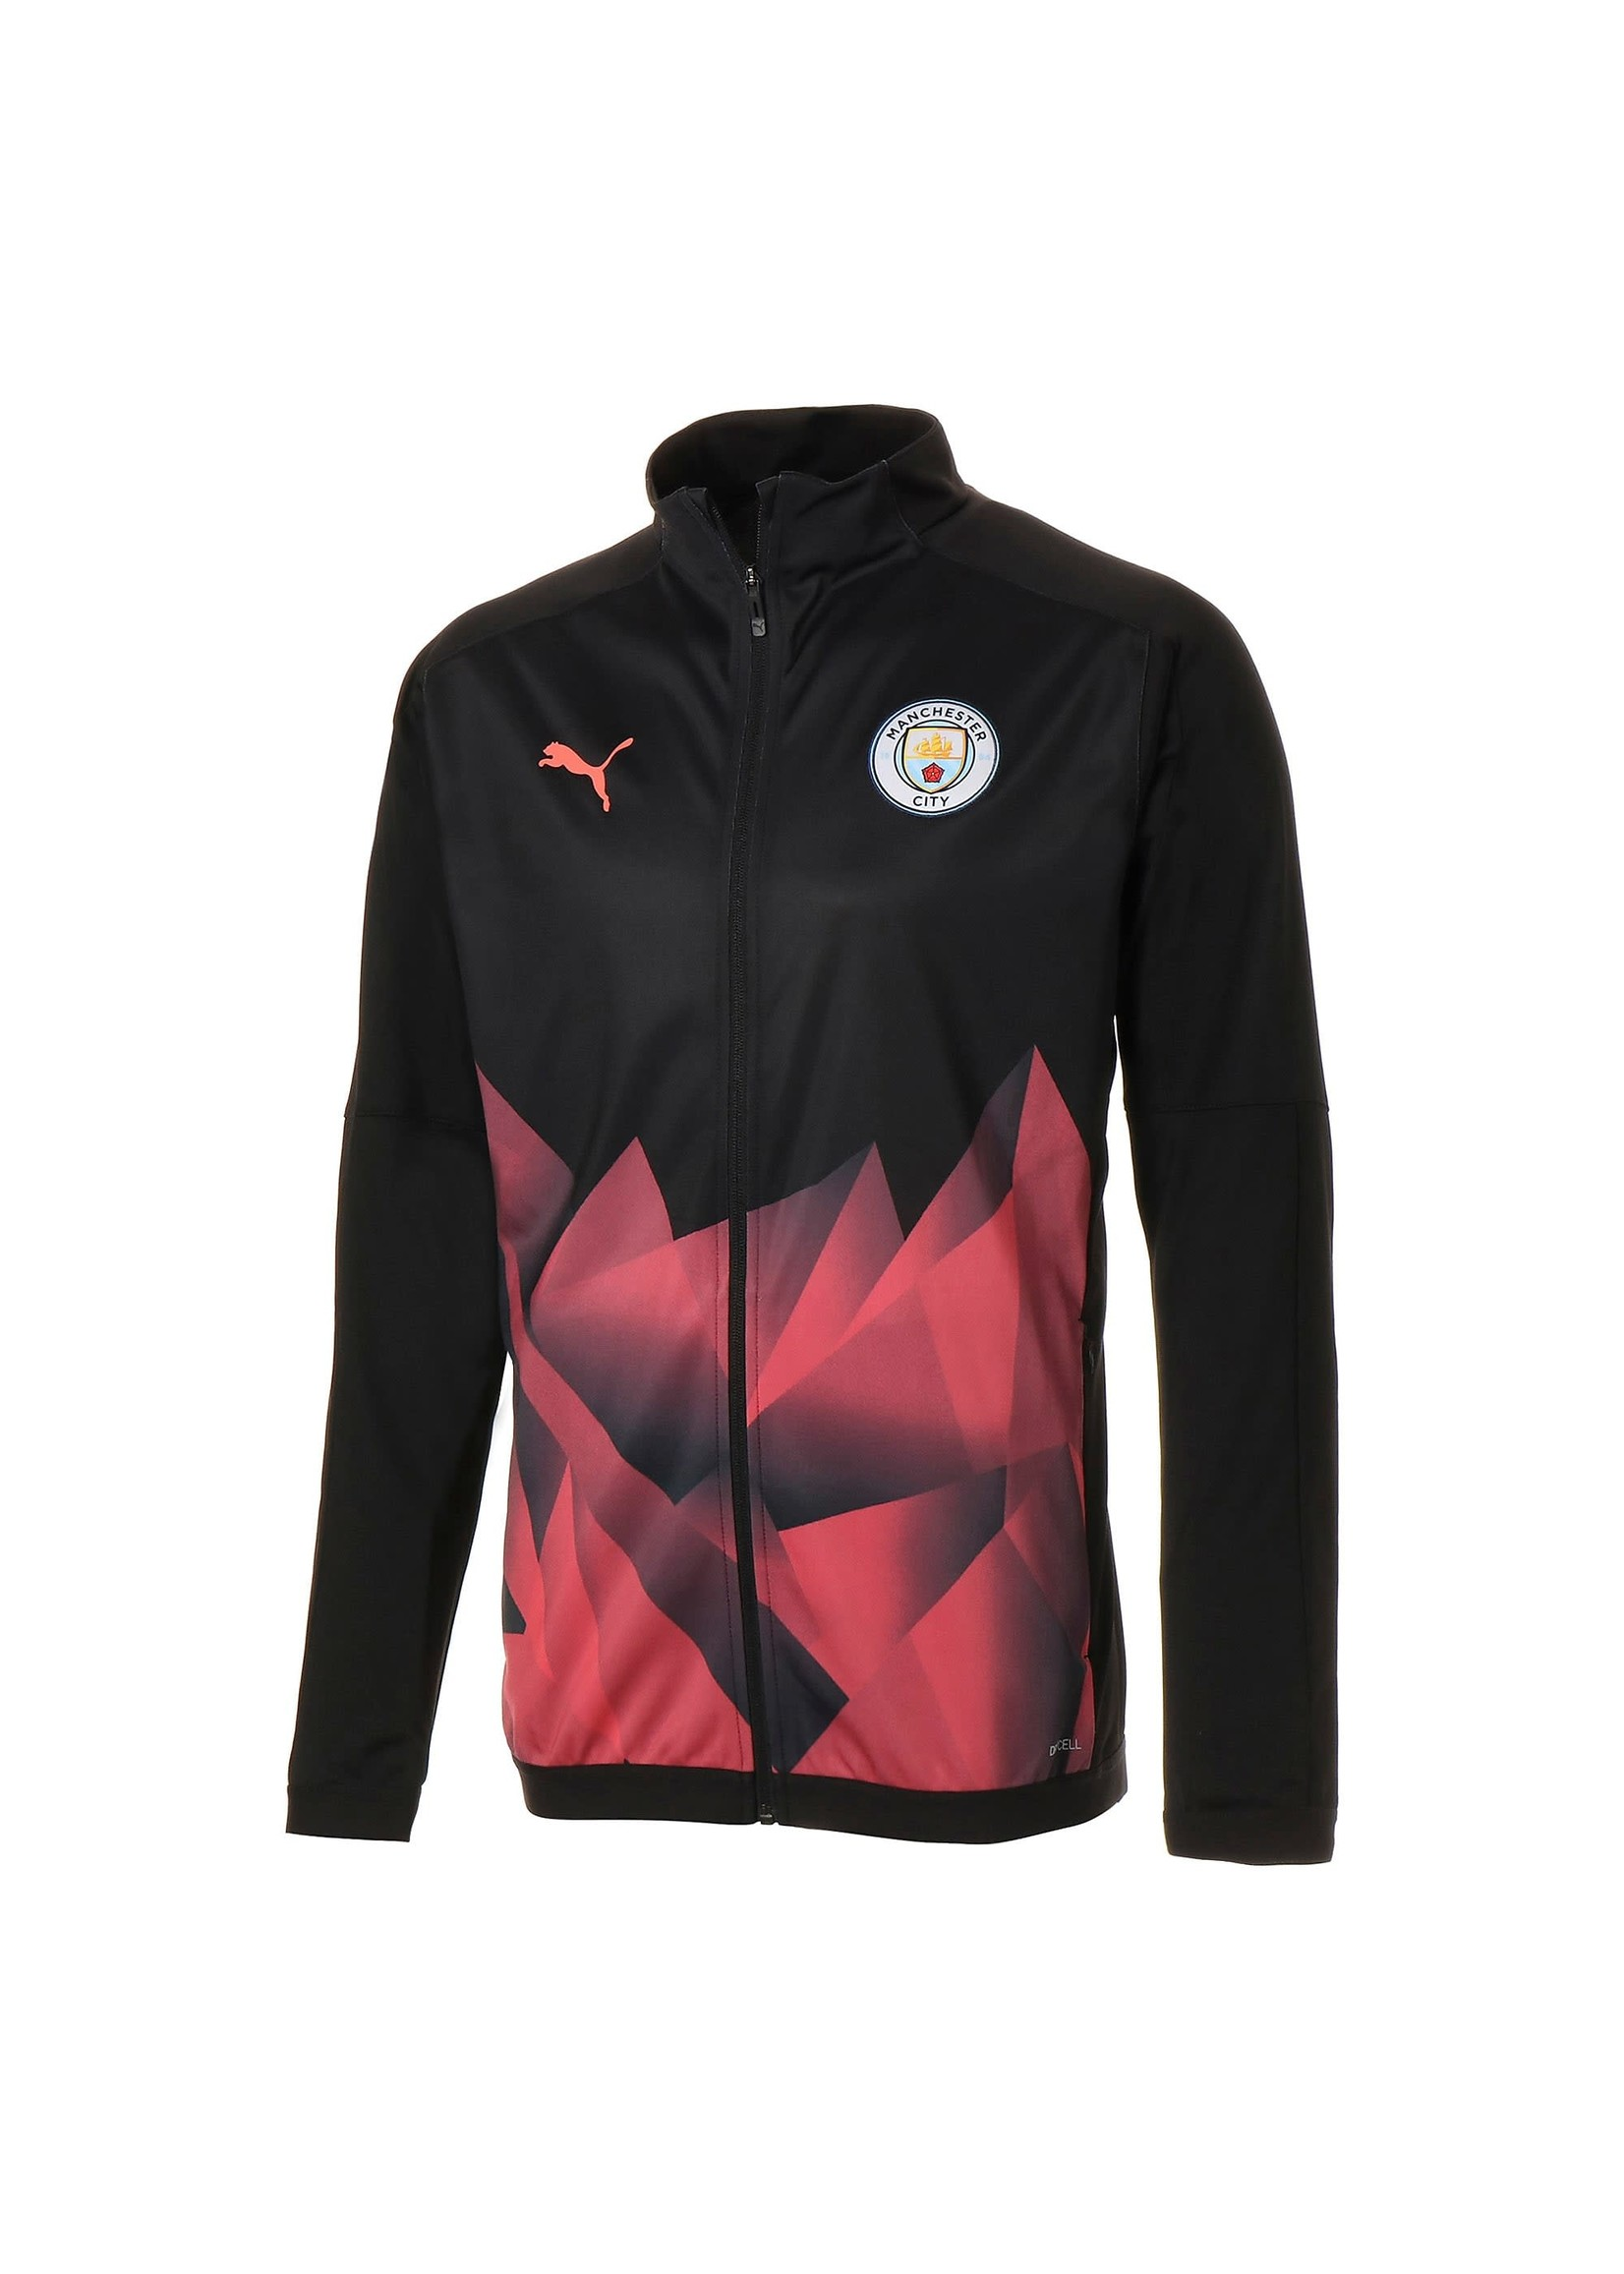 Puma Manchester City Stadium Track Jacket - Black/Red